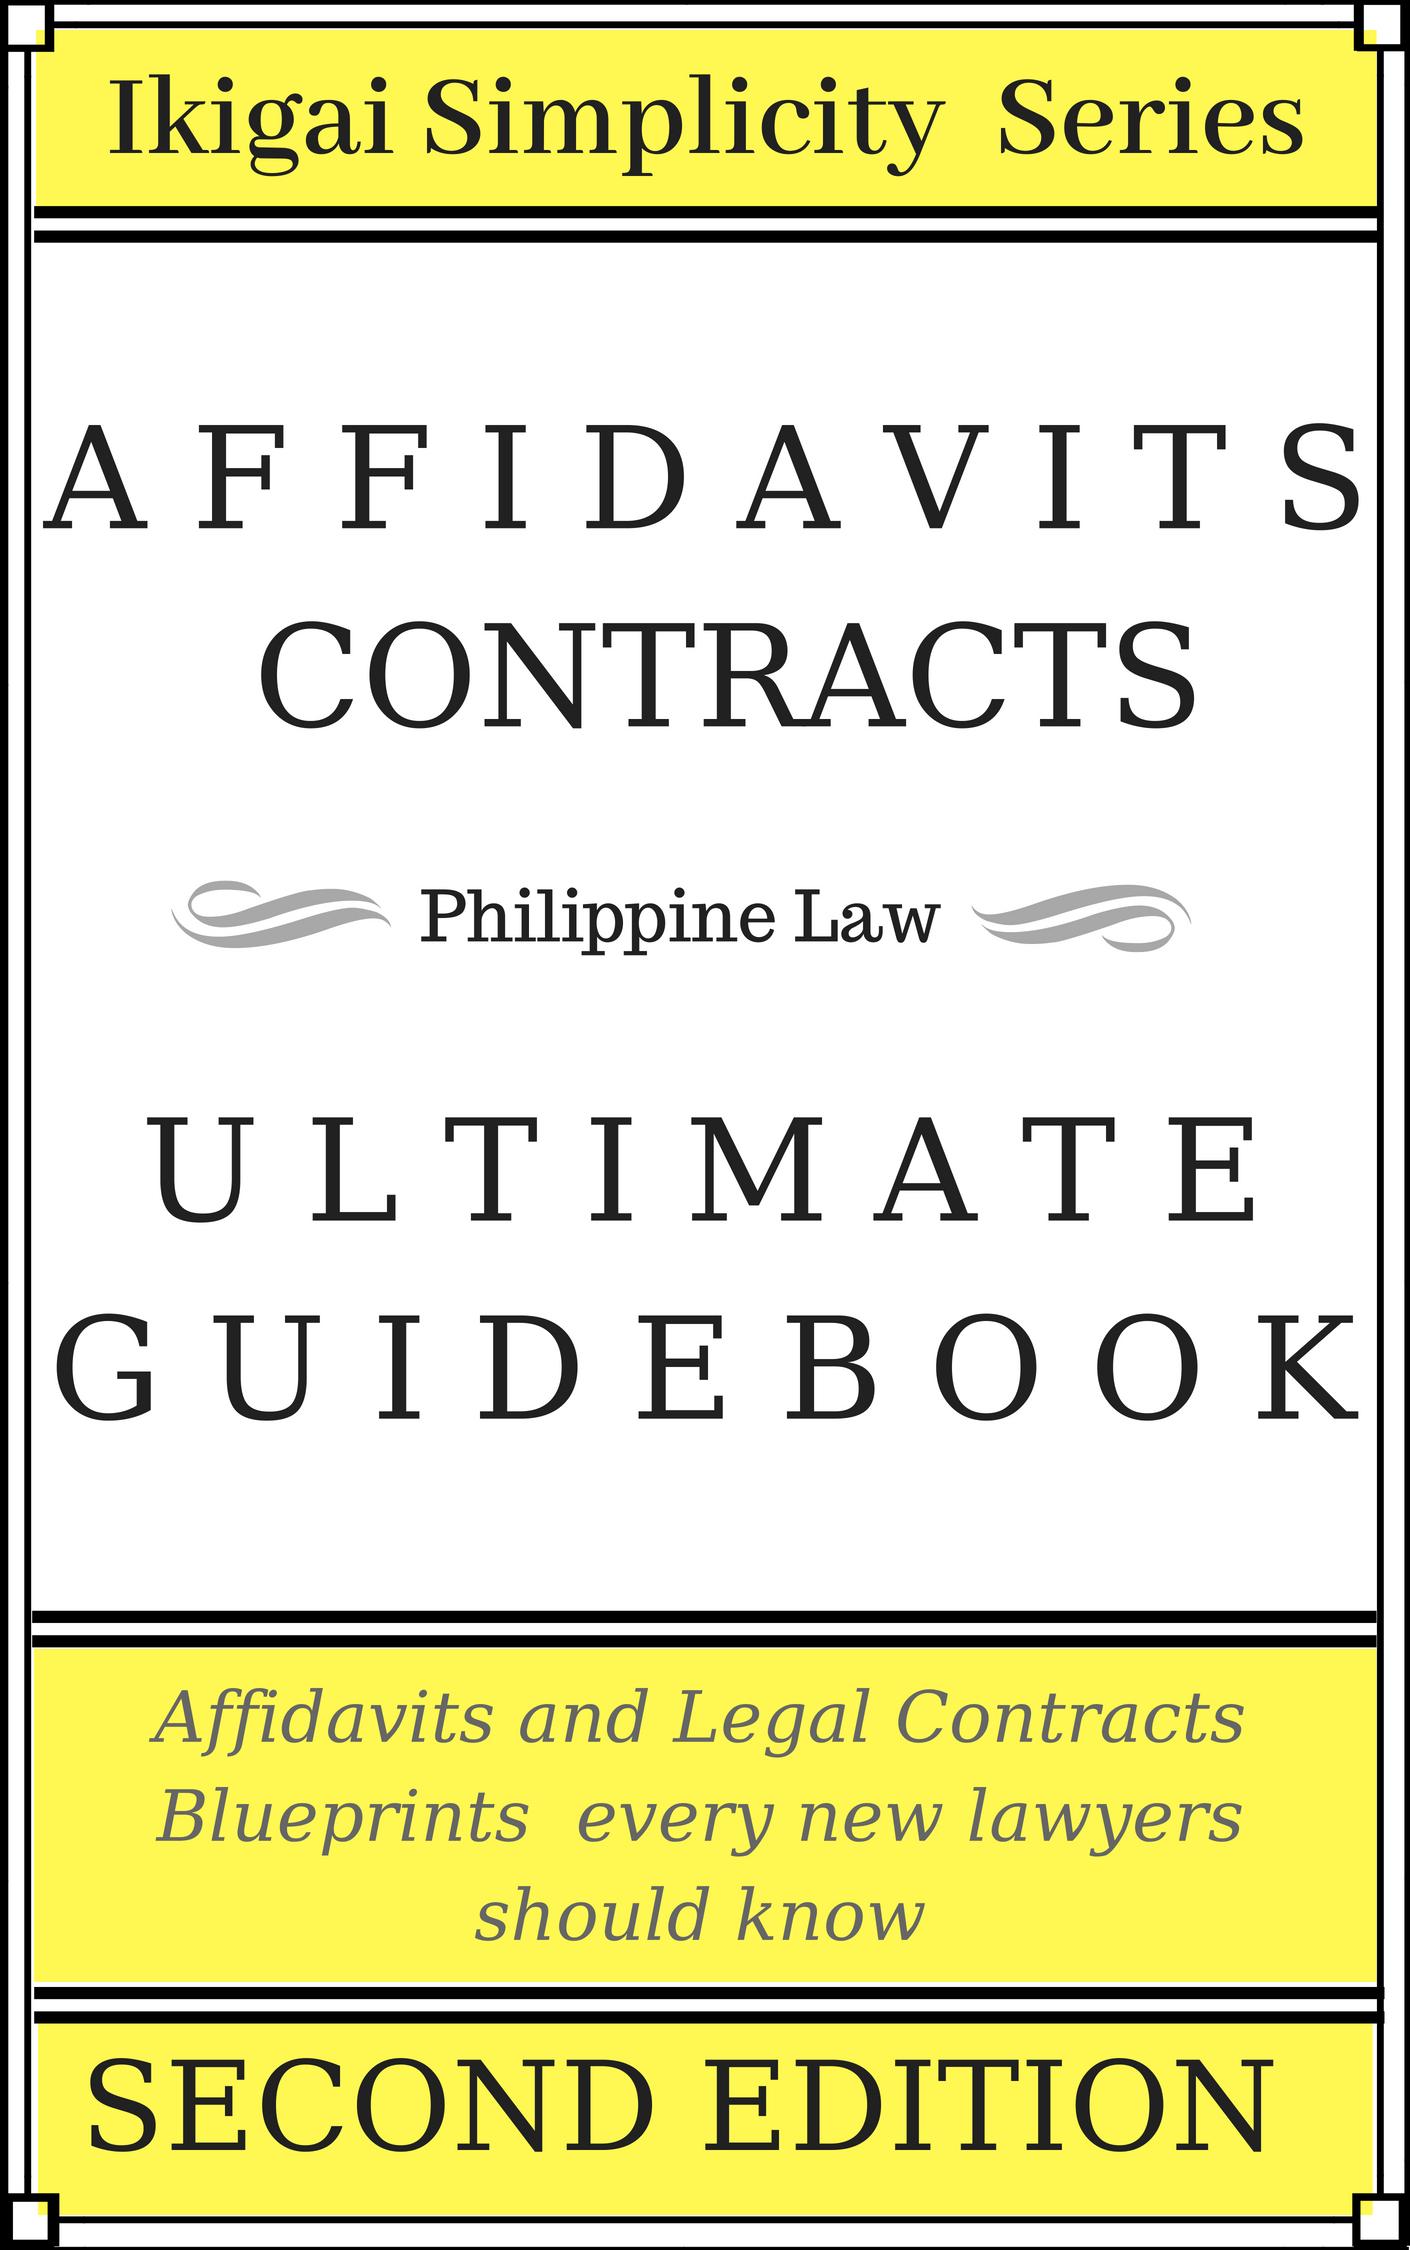 Affidavit Blueprint Second Edition Coming soon!